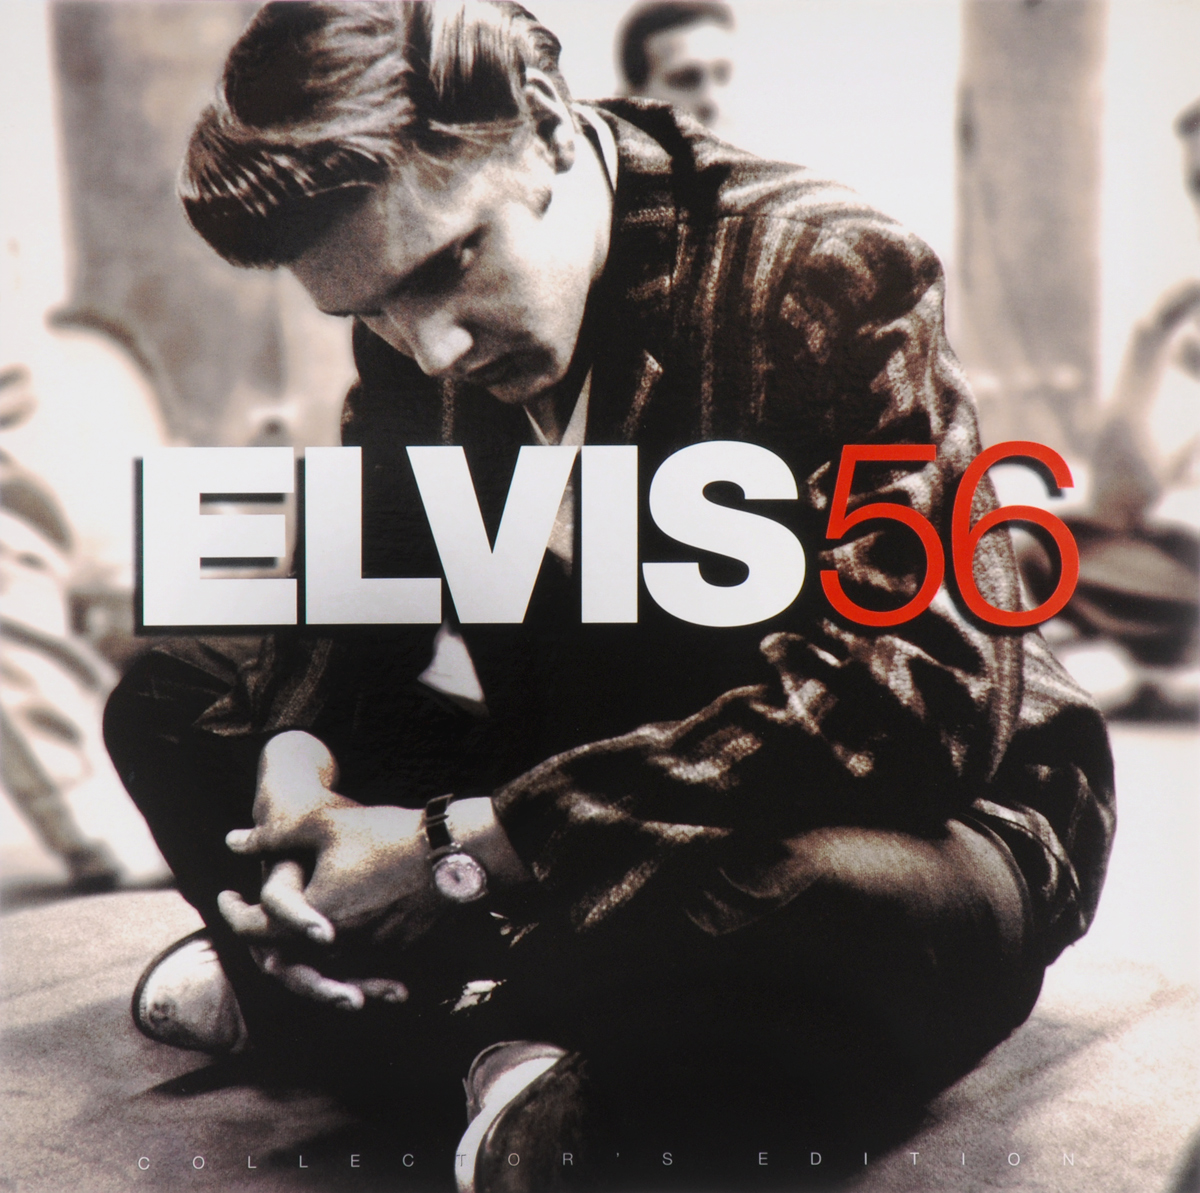 Элвис Пресли Elvis Presley. Elvis 56. Collector's Edition (LP) elvis presley – 30 1 hits 2 lp